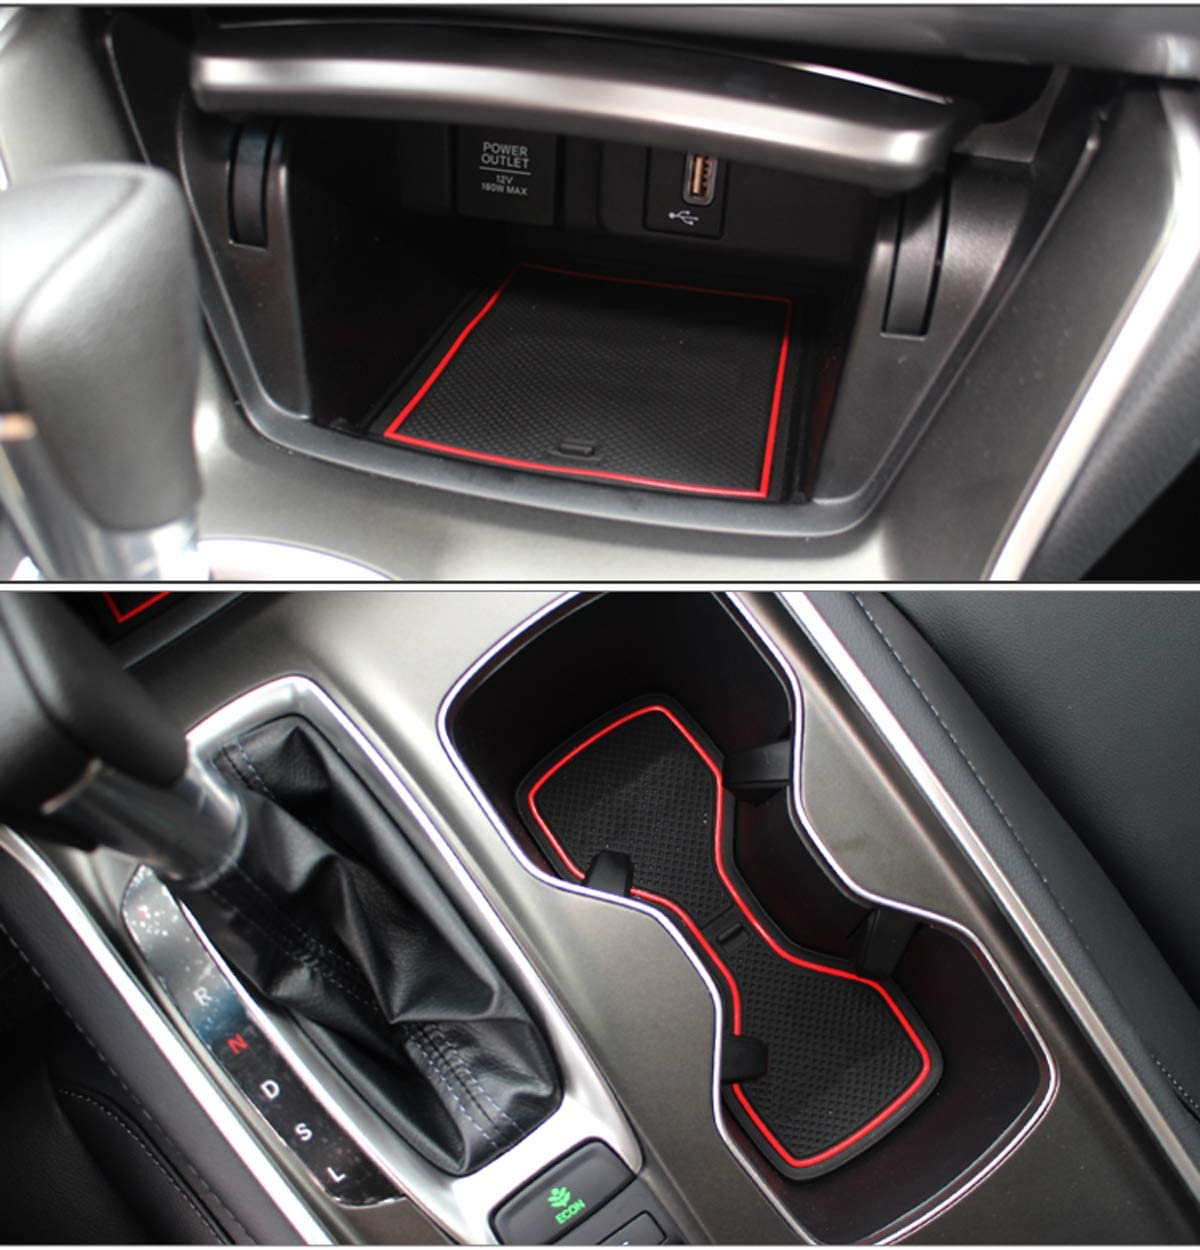 GGBAILEY D2443A-F1A-BK-LP Custom Fit Car Mats for 2007 2010 Saturn Outlook Black Loop Driver /& Passenger Floor 2009 2008